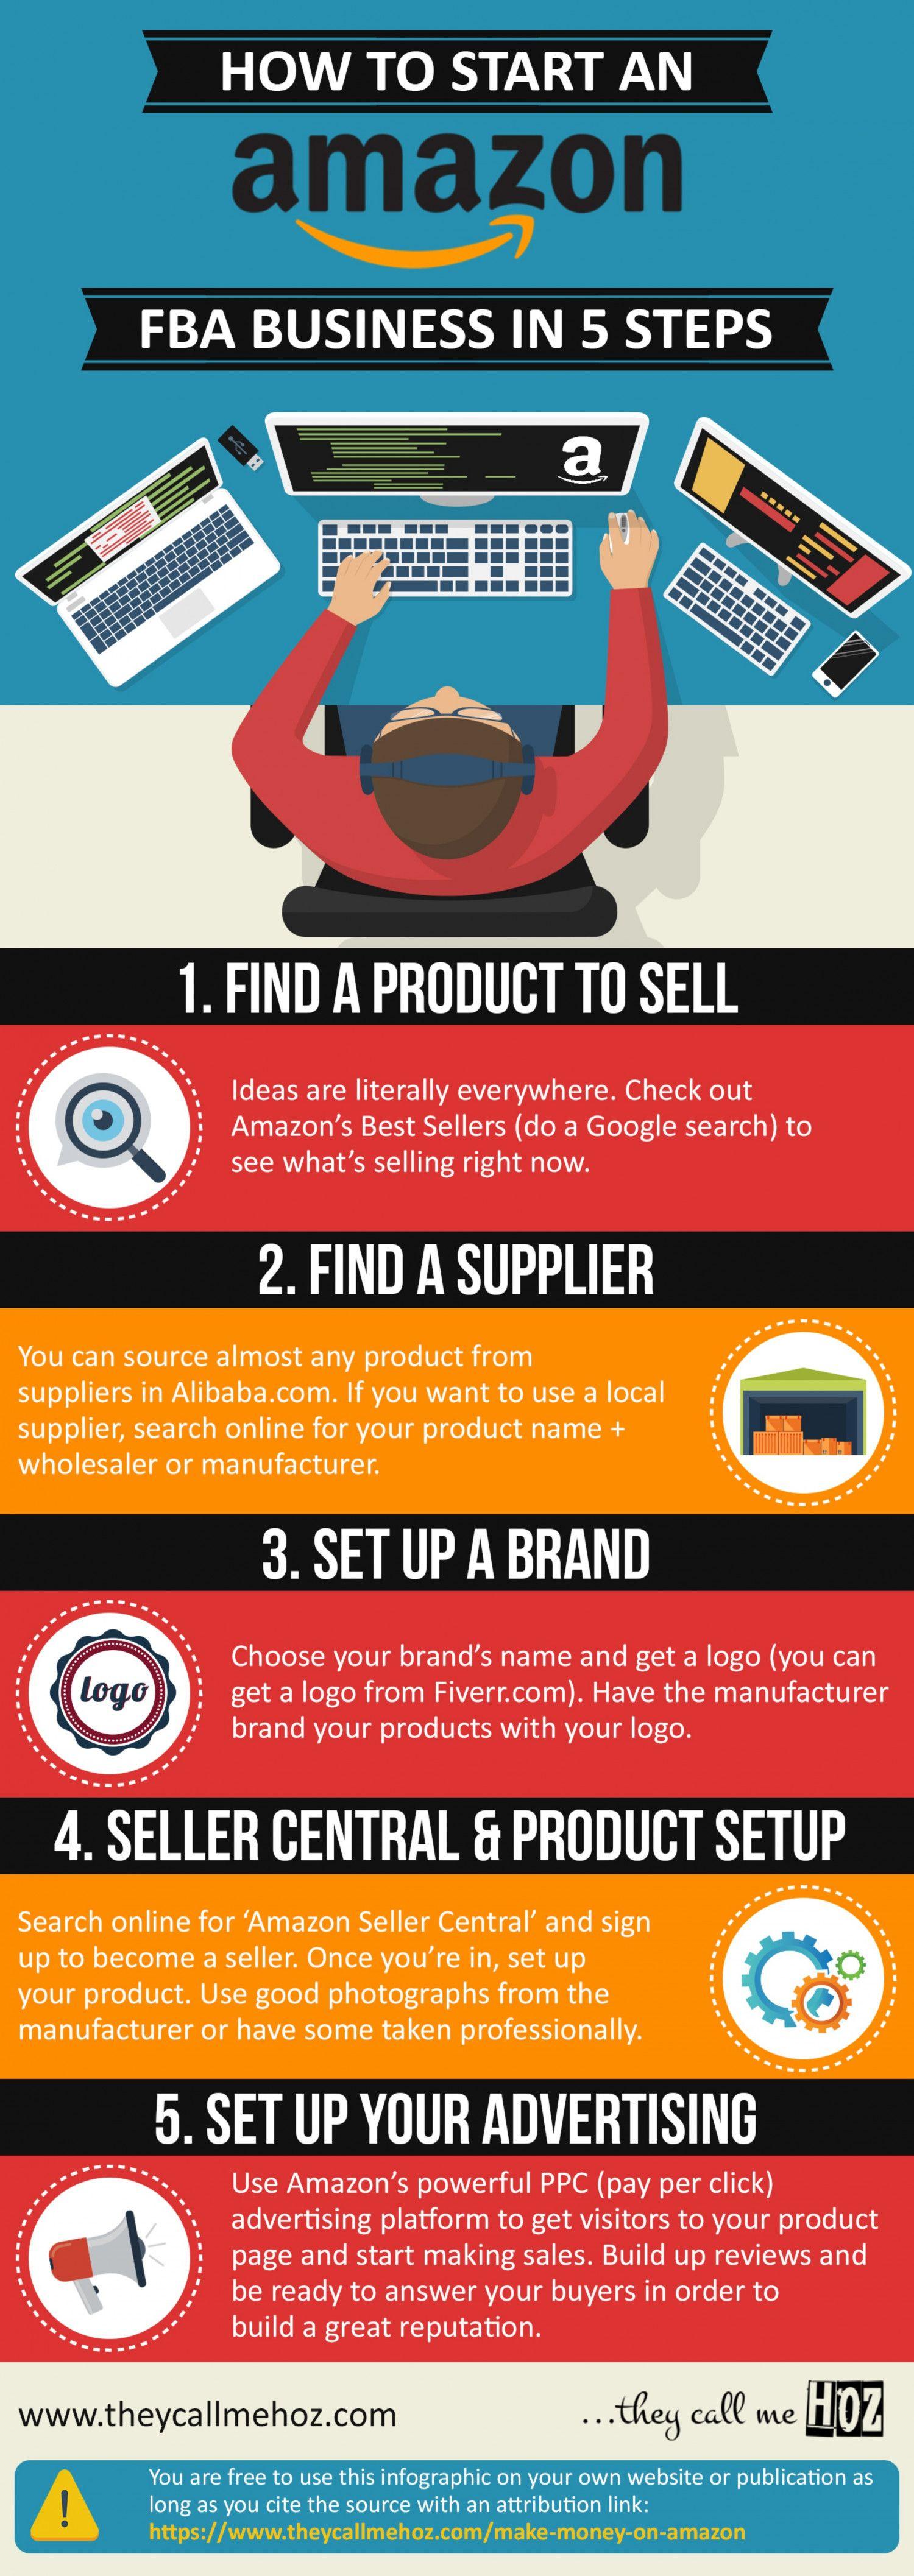 Amazon #FBA #Infographic: How to Start an Amazon FBA